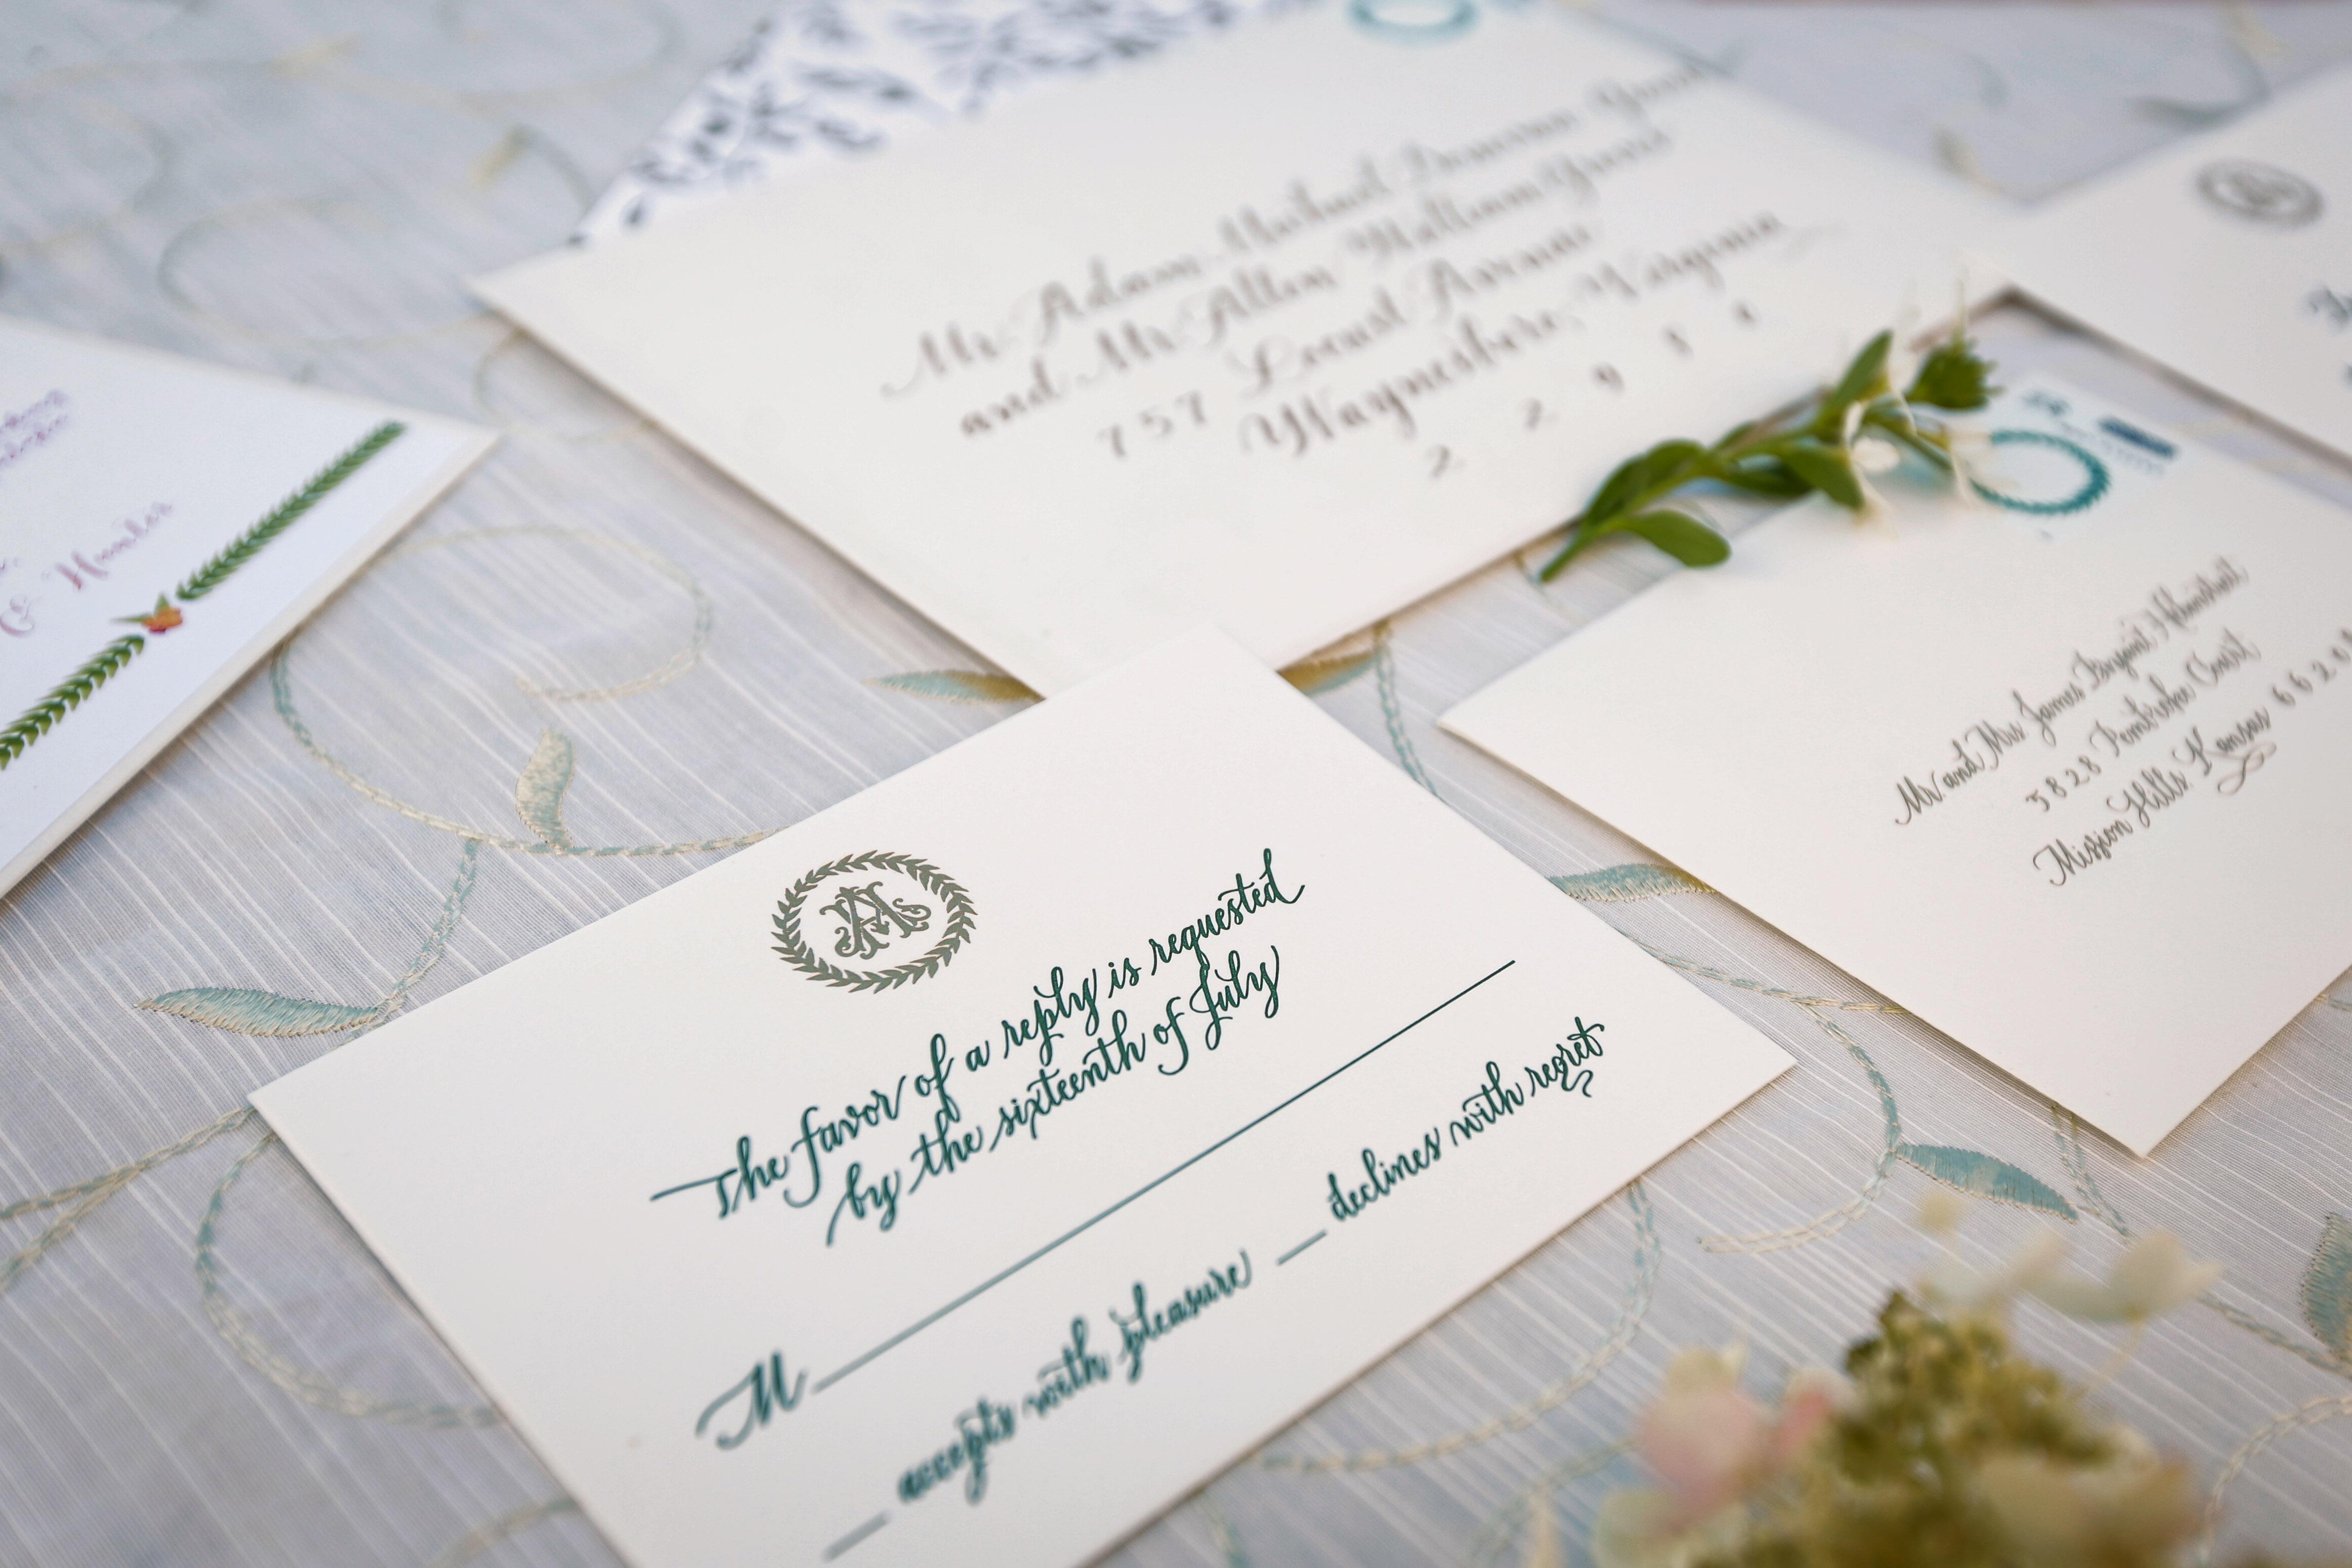 invitation protocol keep info separate